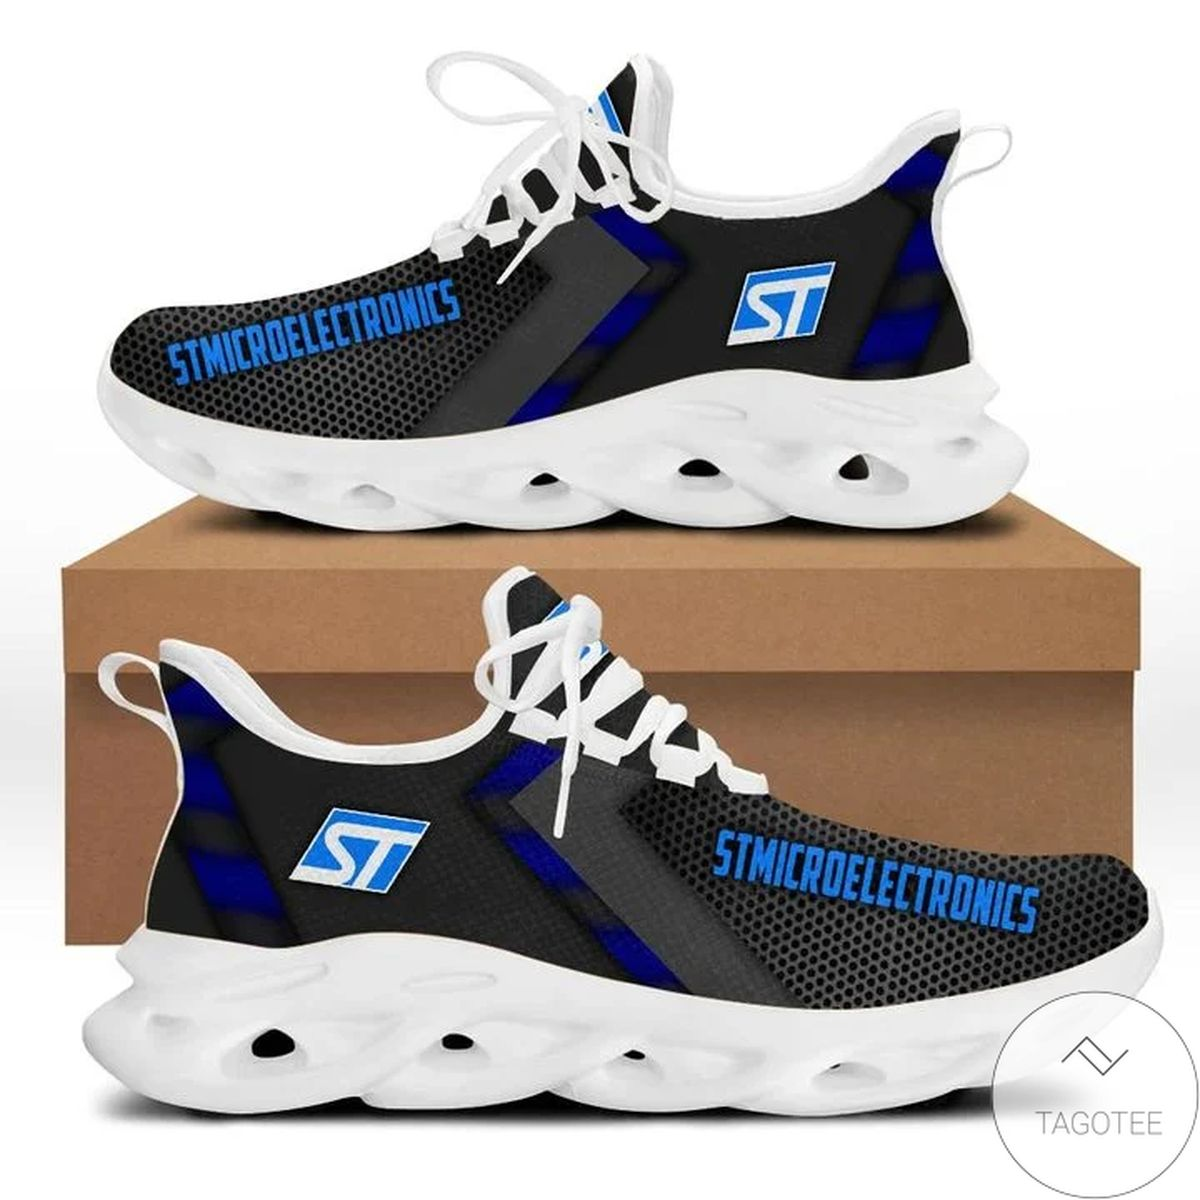 eBay Stmicroelectronics Max Soul Shoes